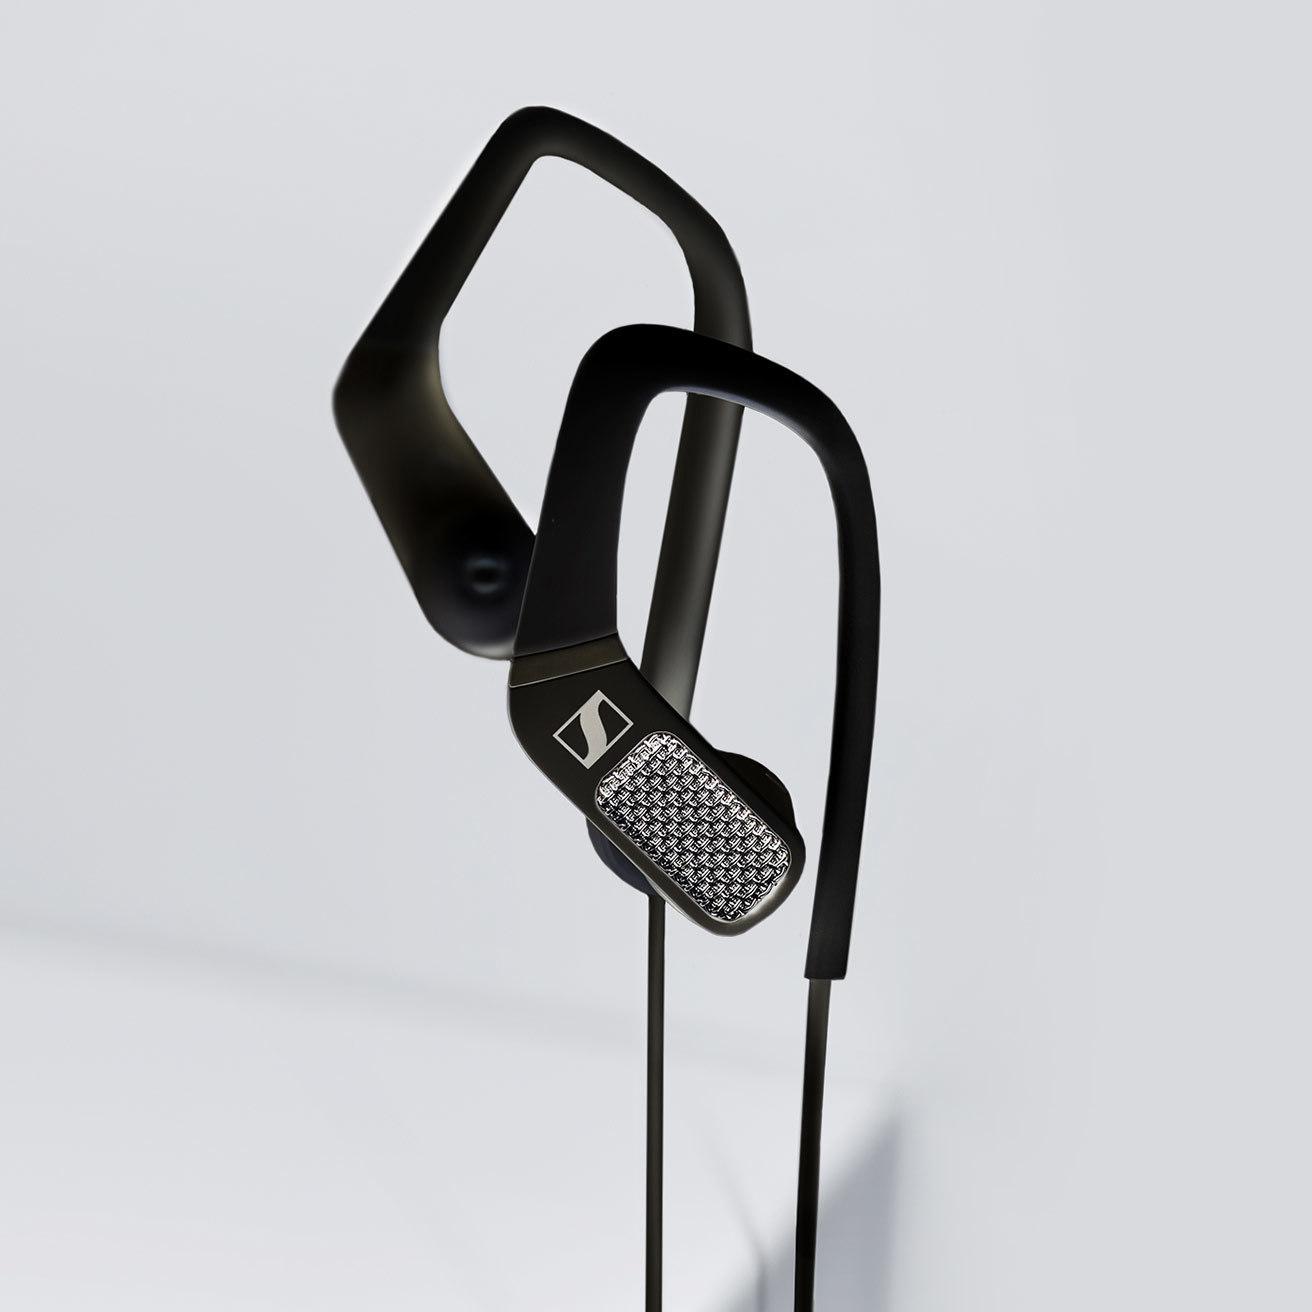 hight resolution of ambeo smart headset